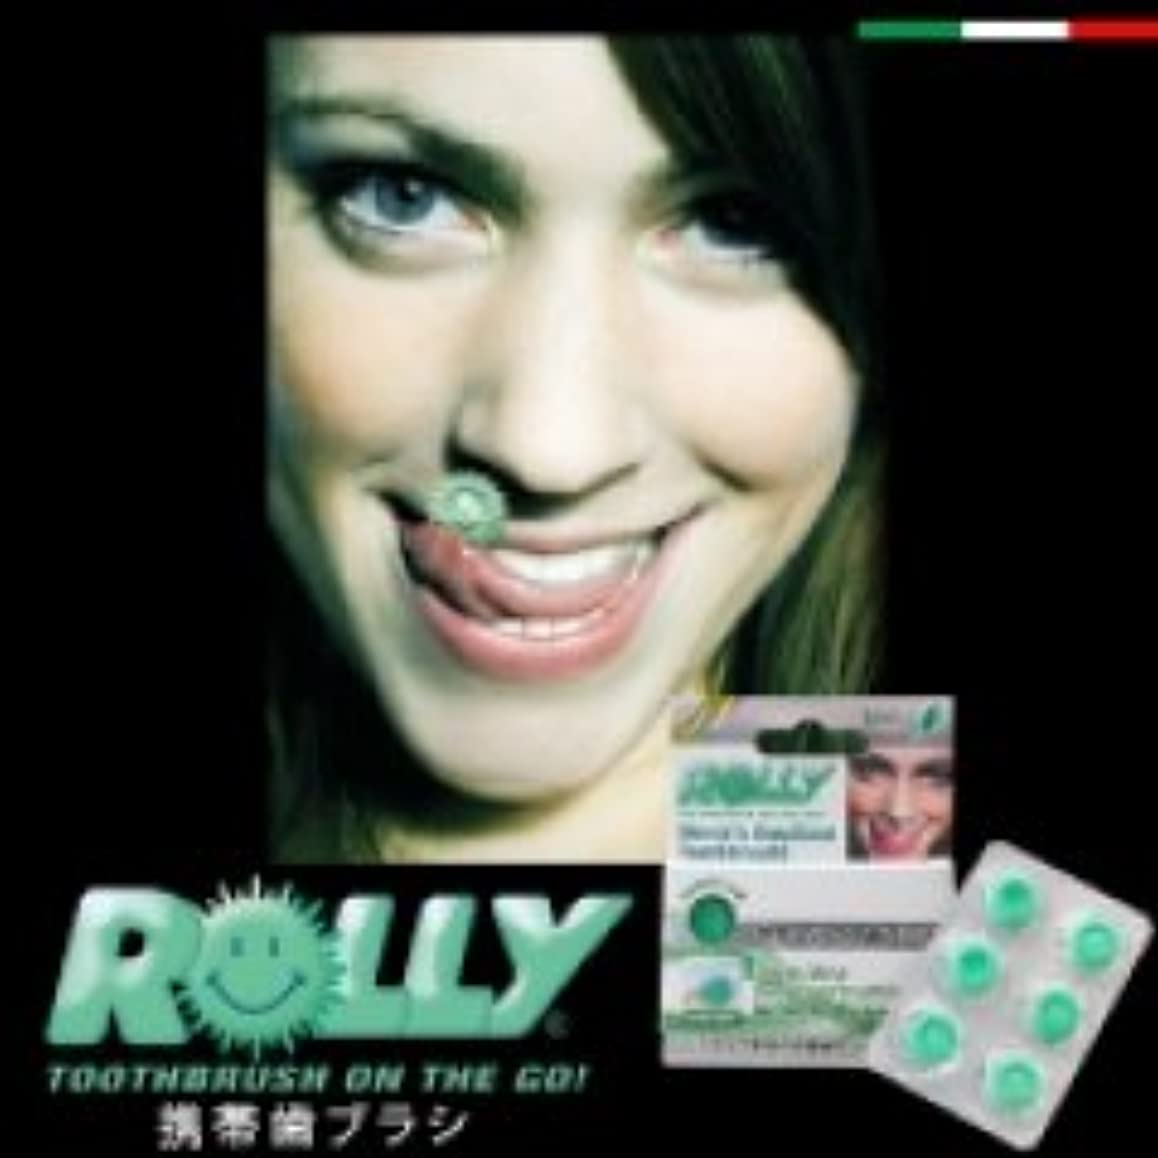 ROLLY ローリーブラッシュ 5箱セット